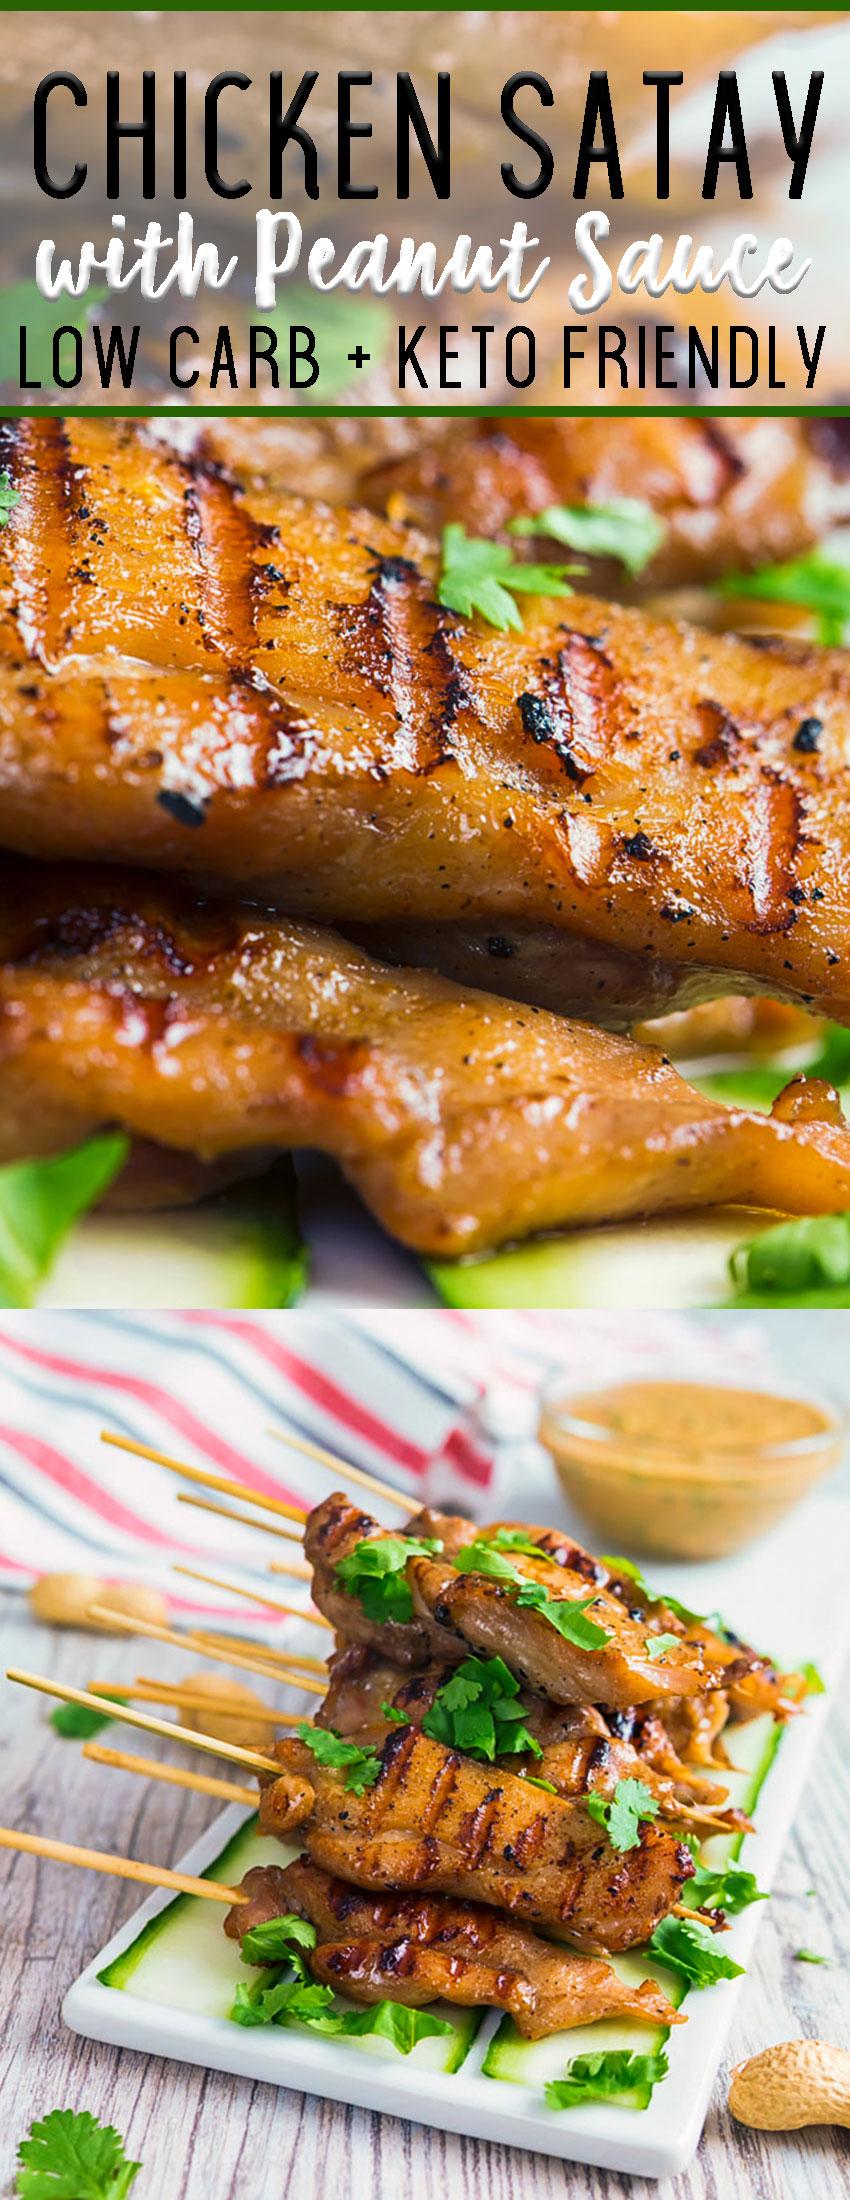 Chicken satay low carb keto friendly